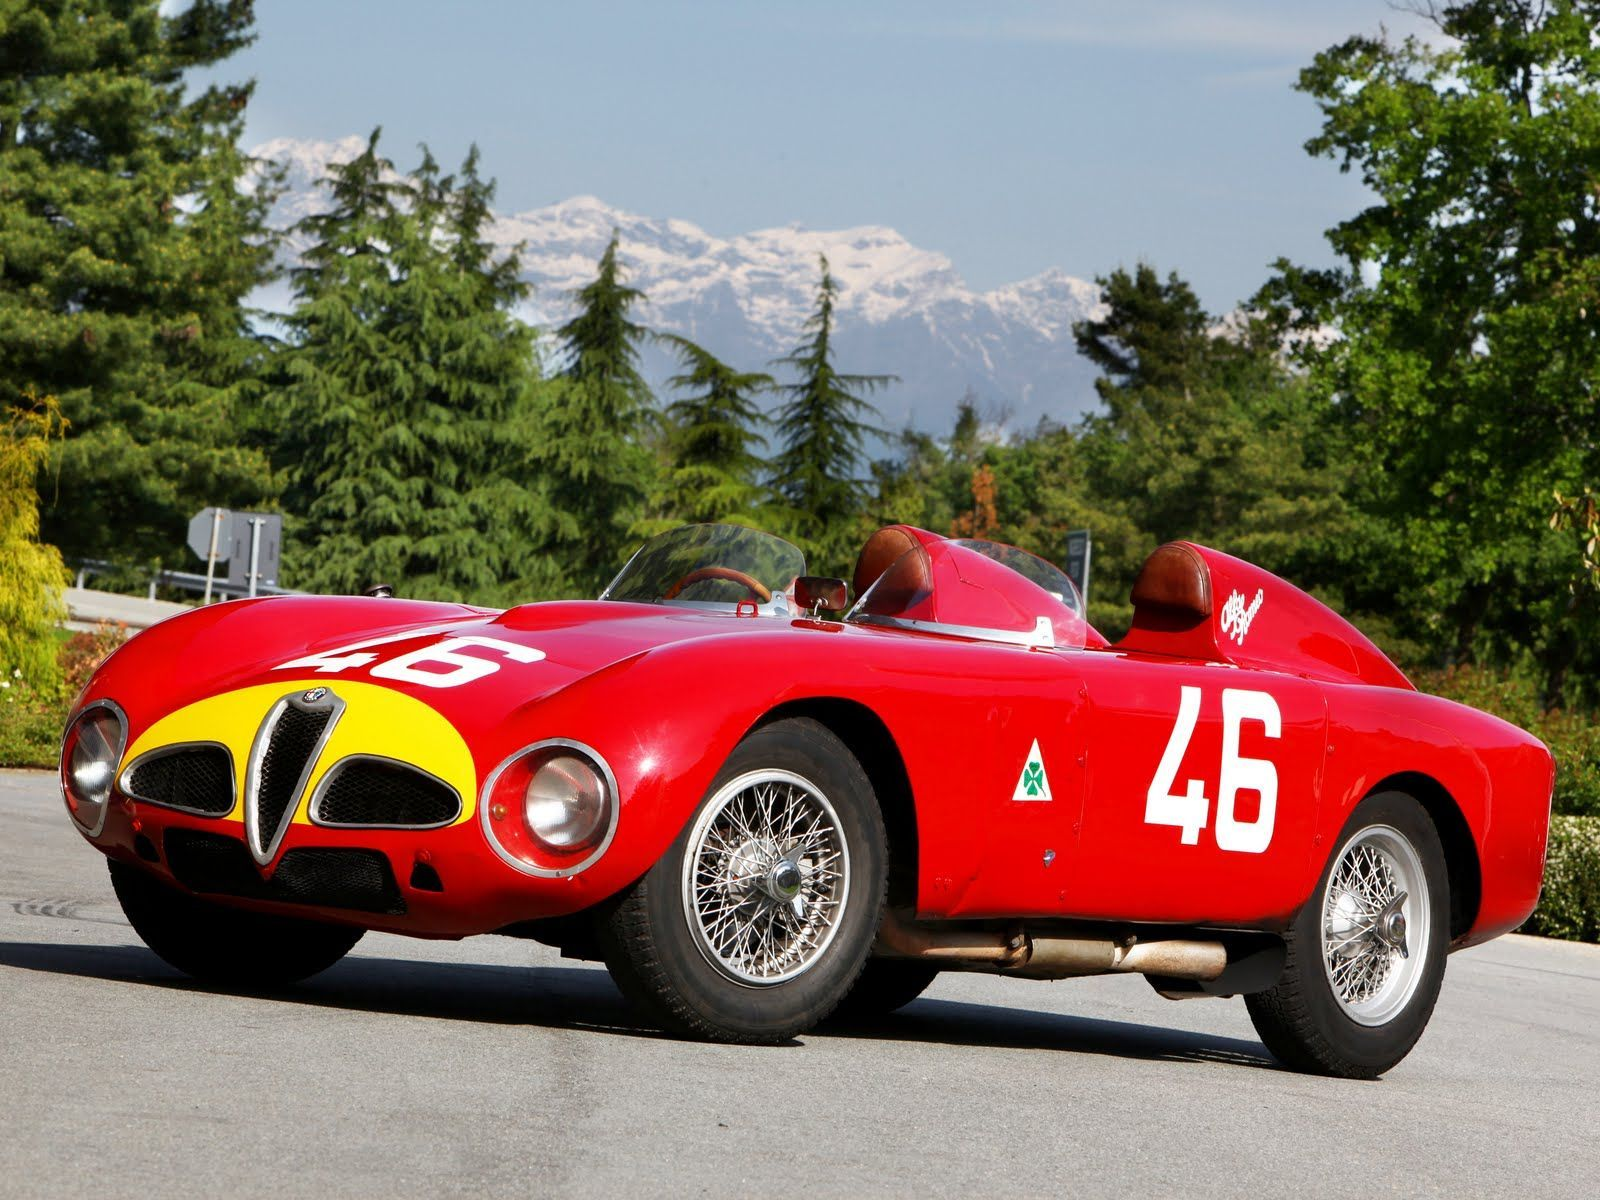 Alfa Romeo 6C 3000 CM '1953 alfaromeodiscovolante (With